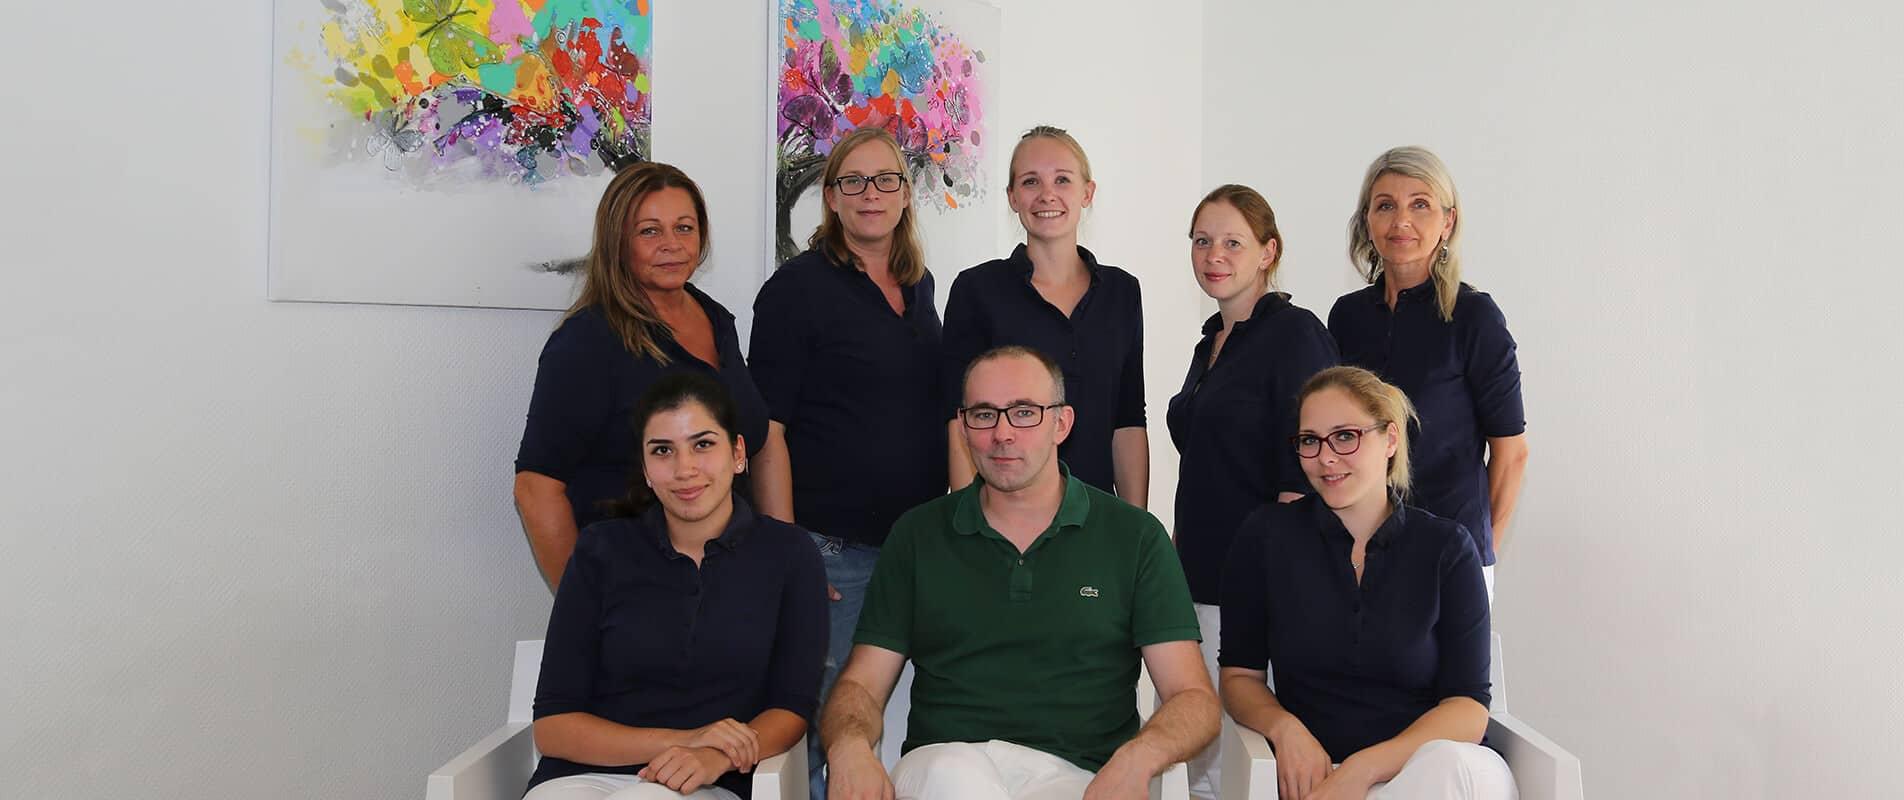 Dr-Bauckloh-Bochum-Praxisbild-slider